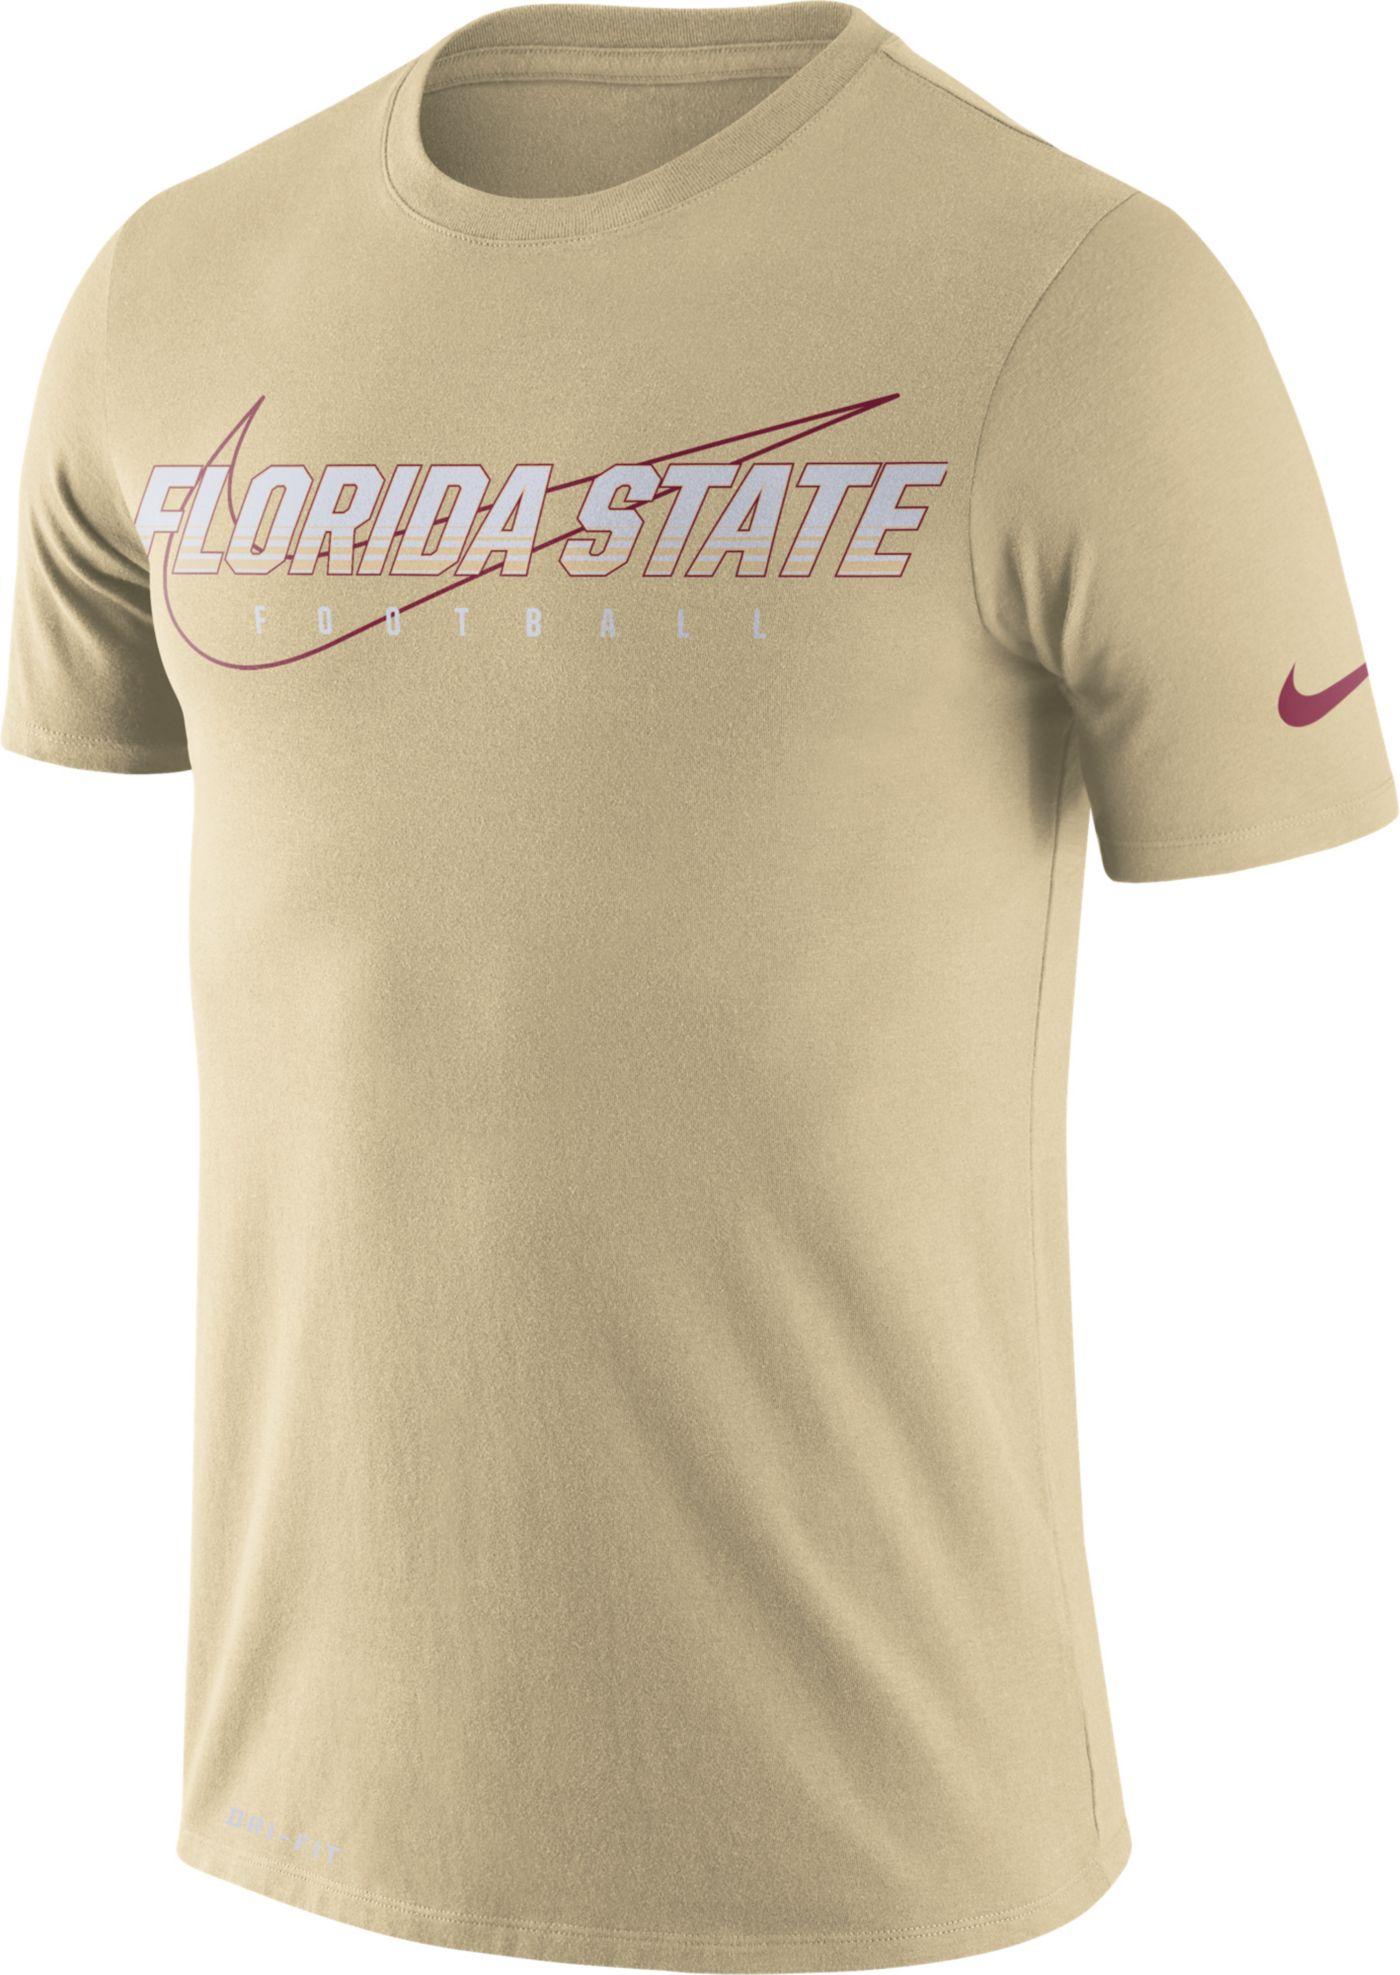 Nike Men's Florida State Seminoles Gold Football Dri-FIT Cotton Facility T-Shirt